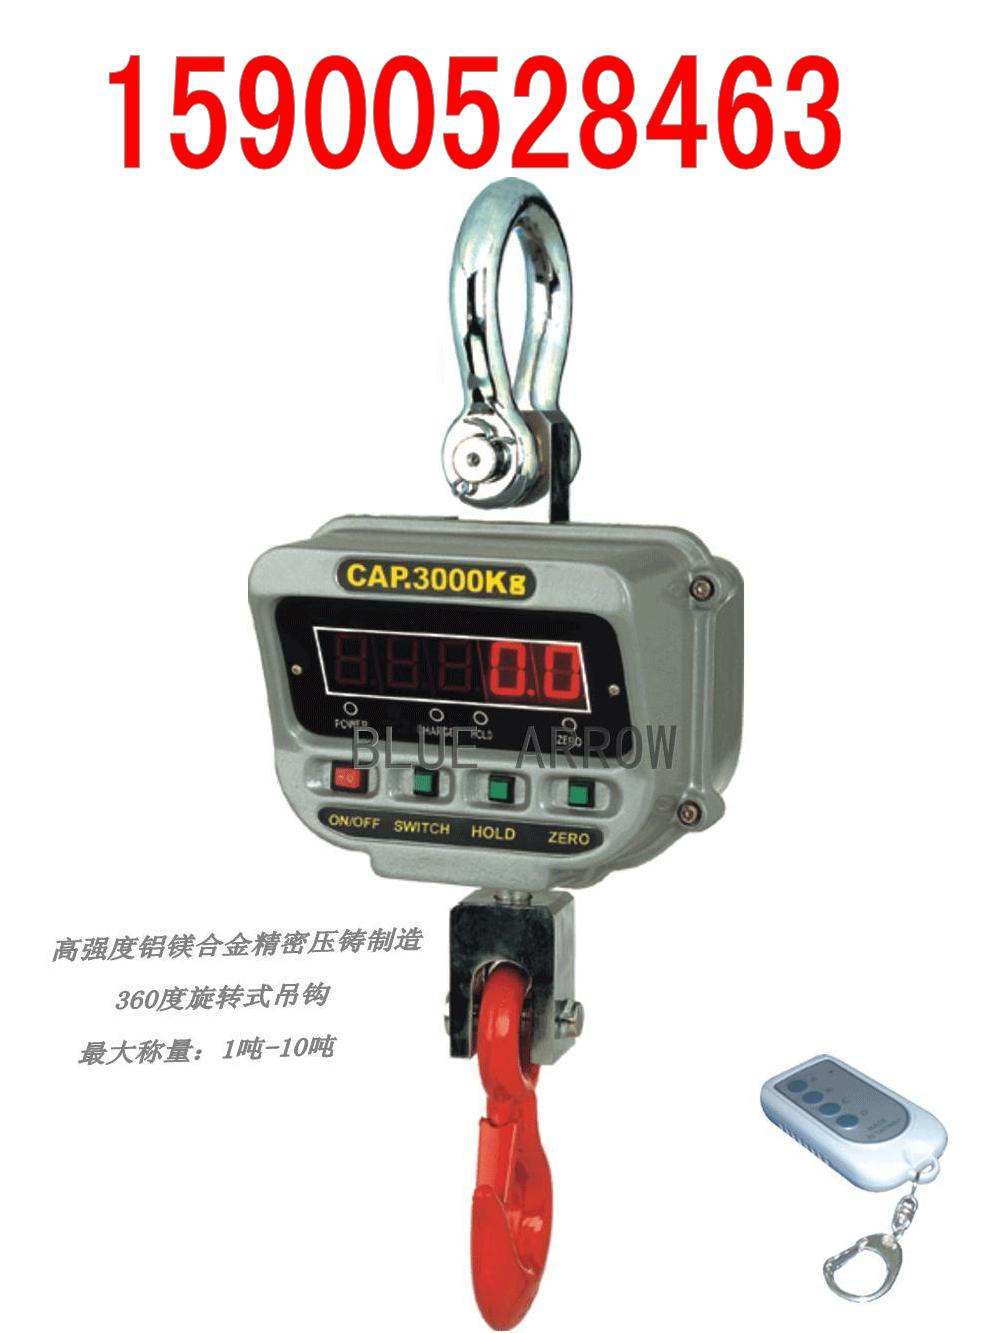 1T电子吊秤,行车电子秤,行车电子吊磅,2T电子吊秤,3T电子磅